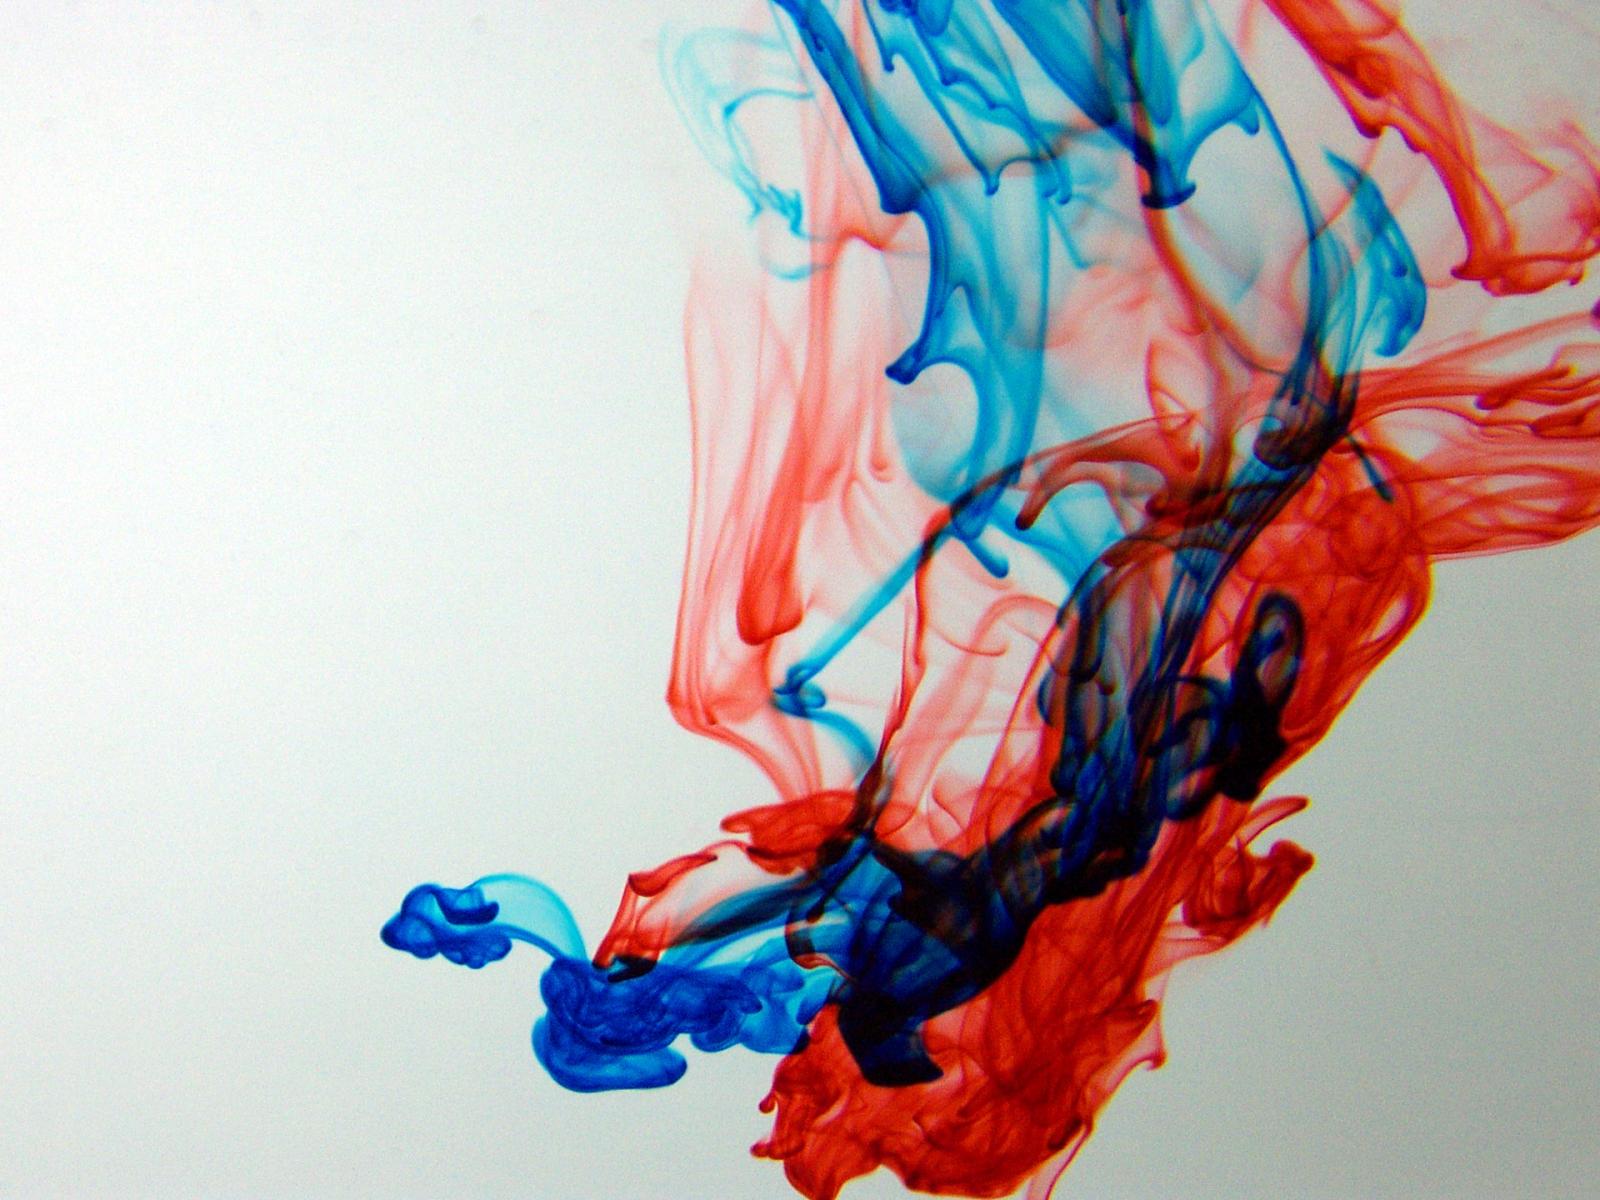 Fluid dye namics by halley on deviantart - Fluid wallpaper ...